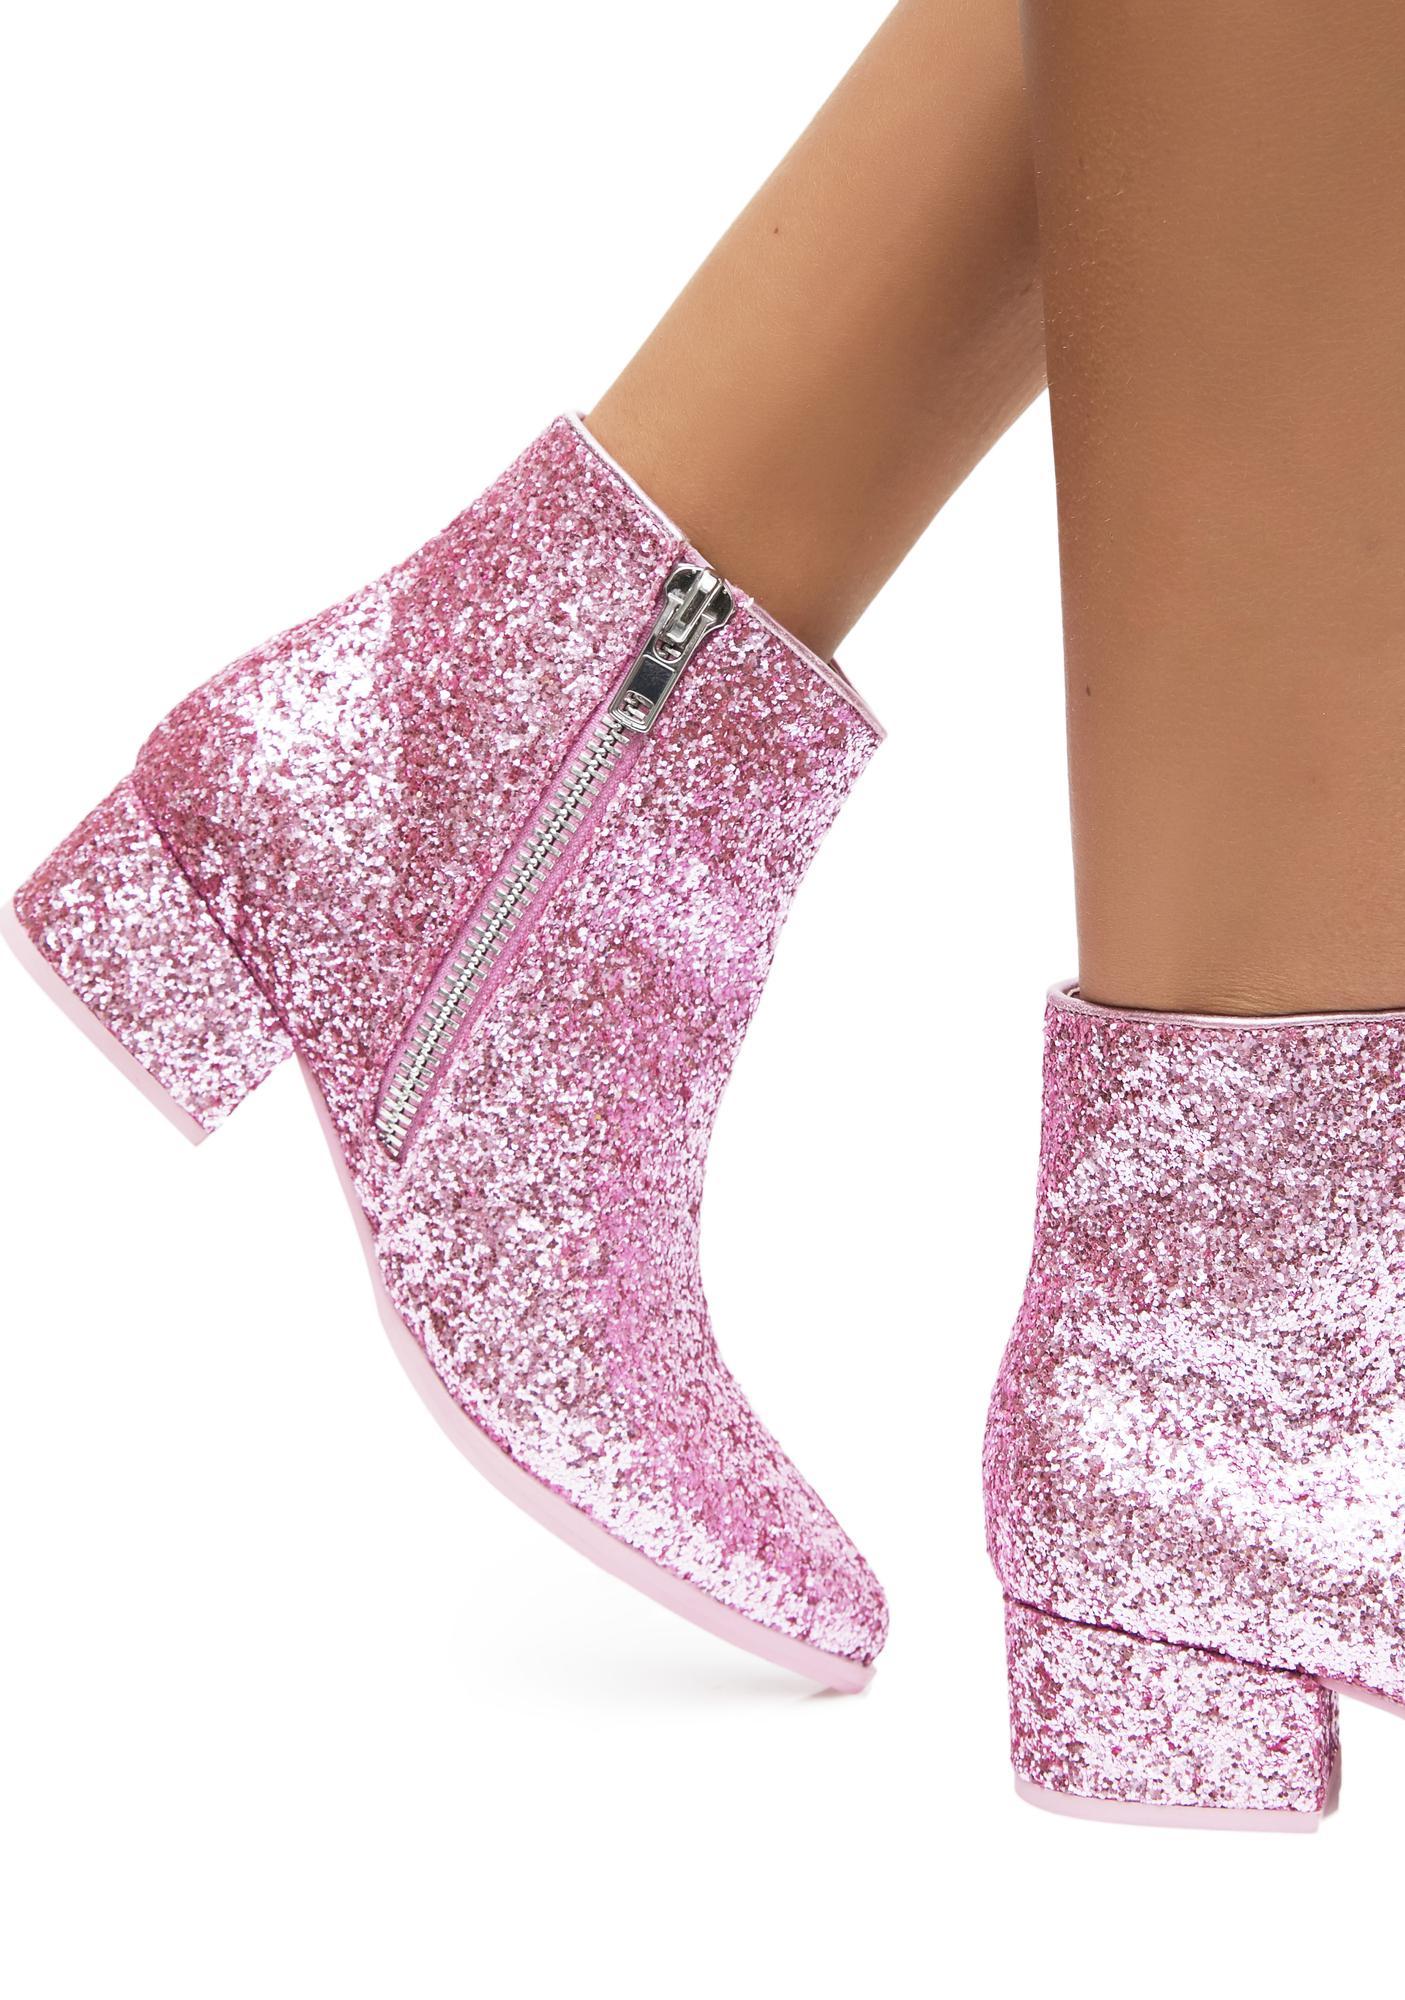 Sugar Thrillz Glitz N' Glam Booties